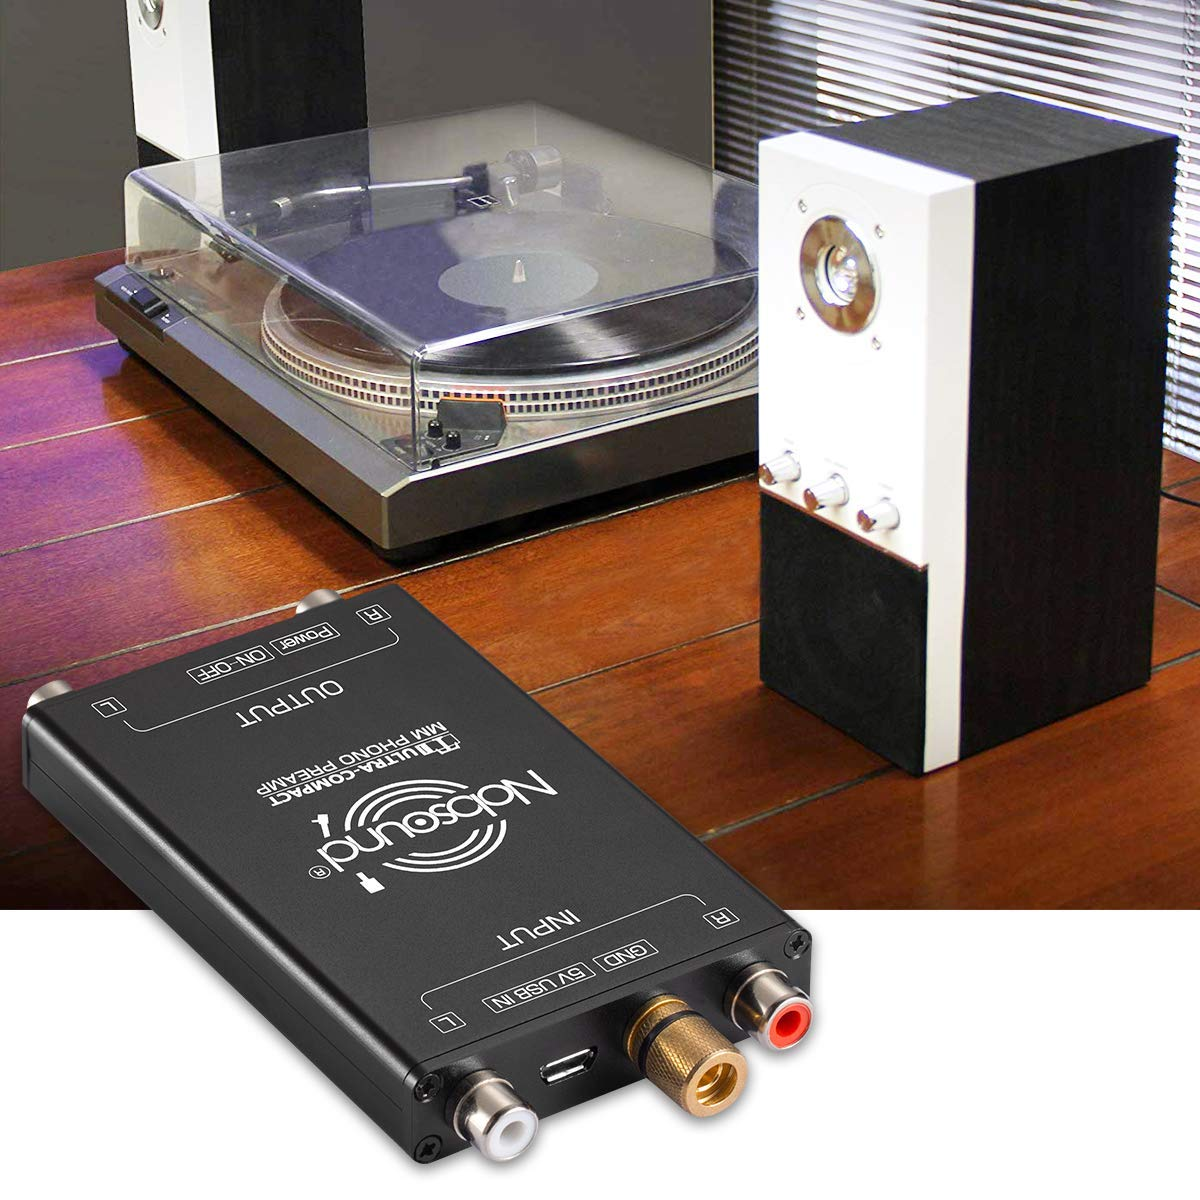 Nobsound T1 Plattenspieler MM Phono Preamp; Mini Plattenspieler Vorverst/ärker Hi-Fi Audio Stereo Phonograph Vorverst/ärker Phono B/ühne ultrakompakt